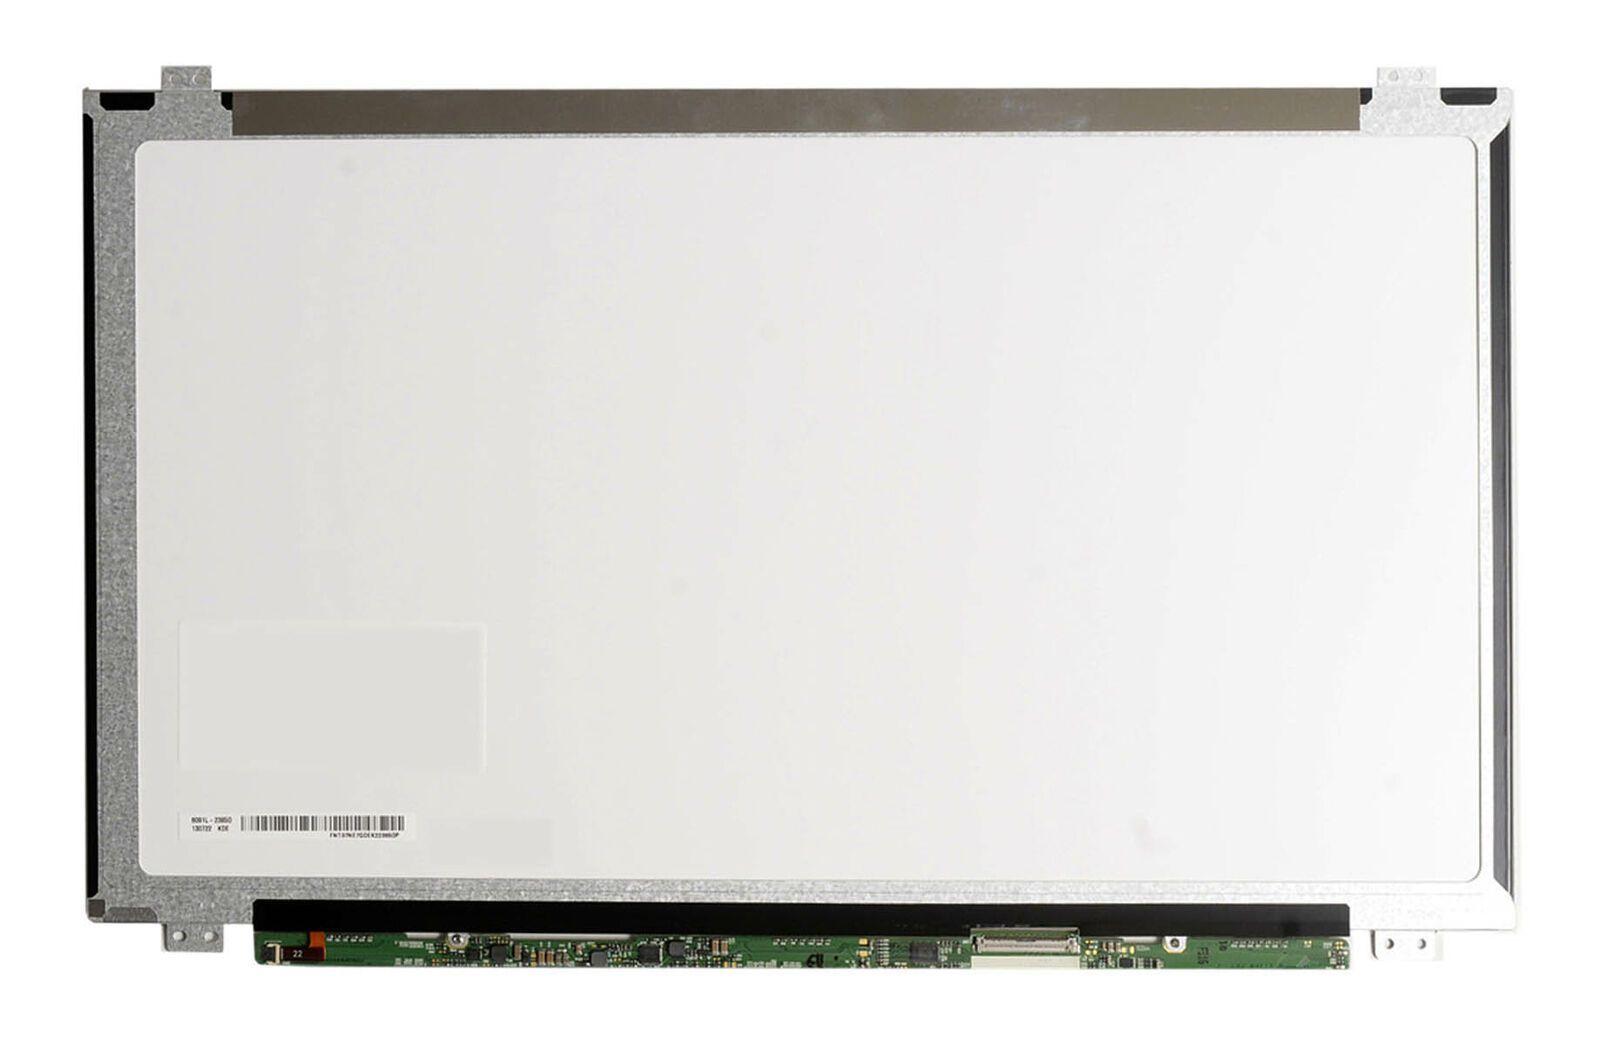 Tela 15.6 Led Slim Para Sony Vaio Sve15137cxw 1366x768 Hd 40 pin - EASY HELP NOTE